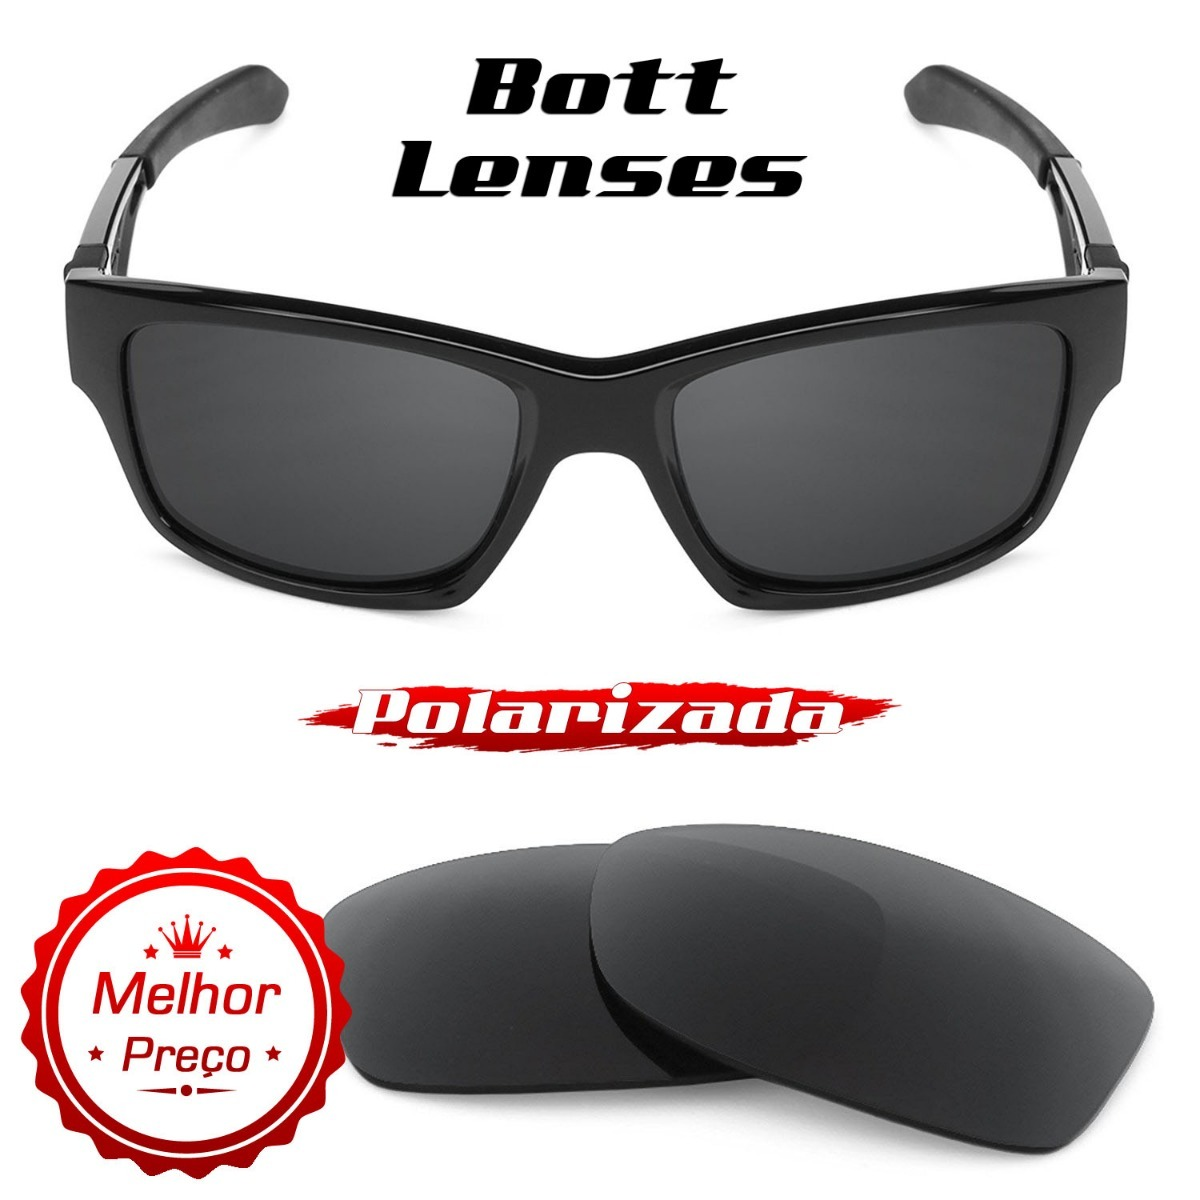 46bf0187cde95 lente óculos jupiter squared preta polarizada bott-lenses. Carregando zoom.